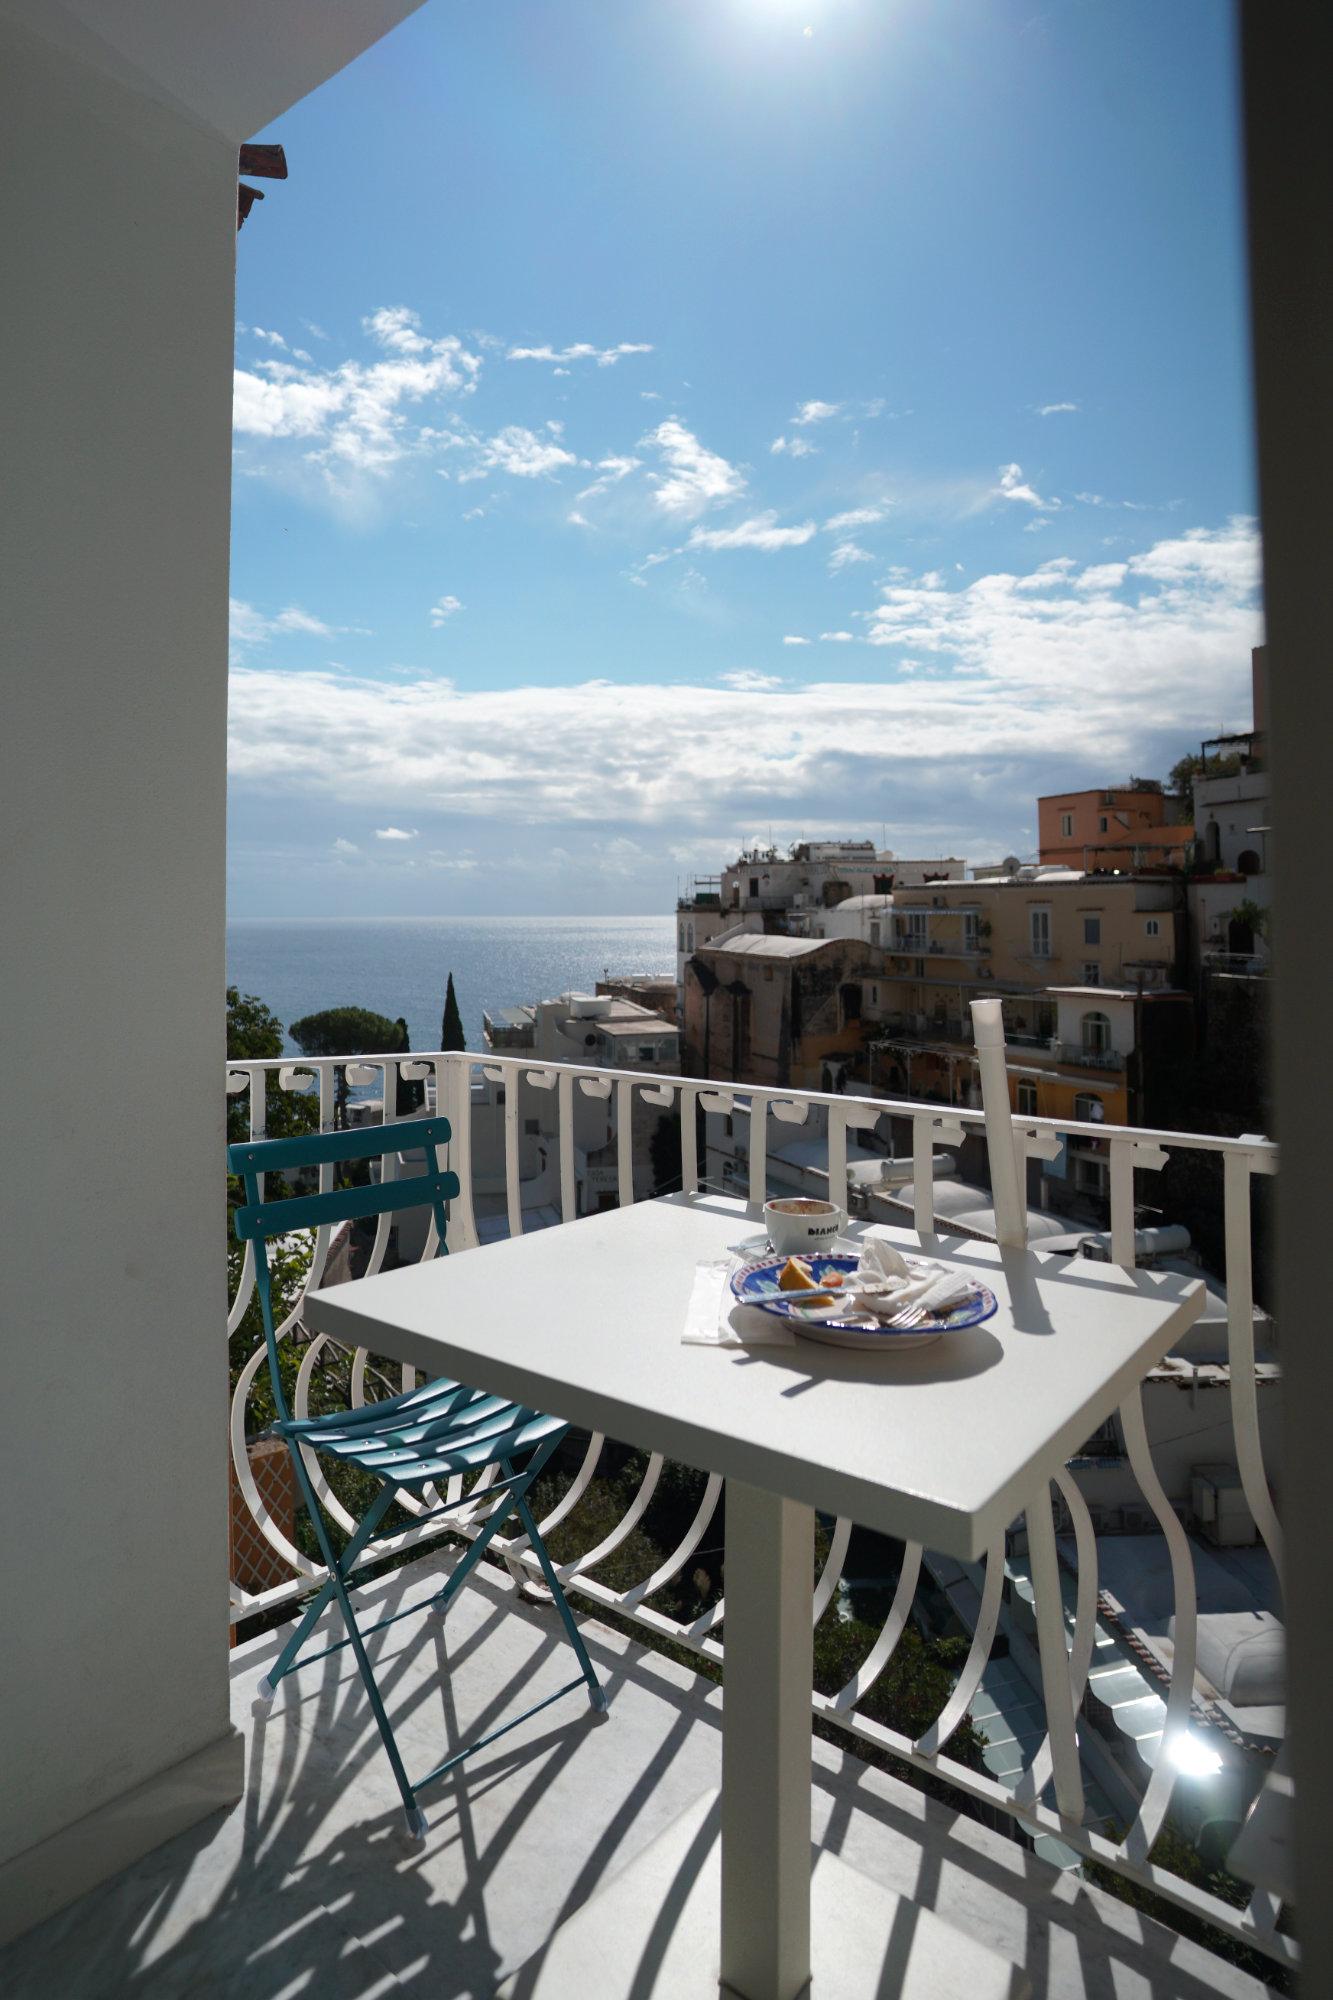 Positano Cafe Balkon